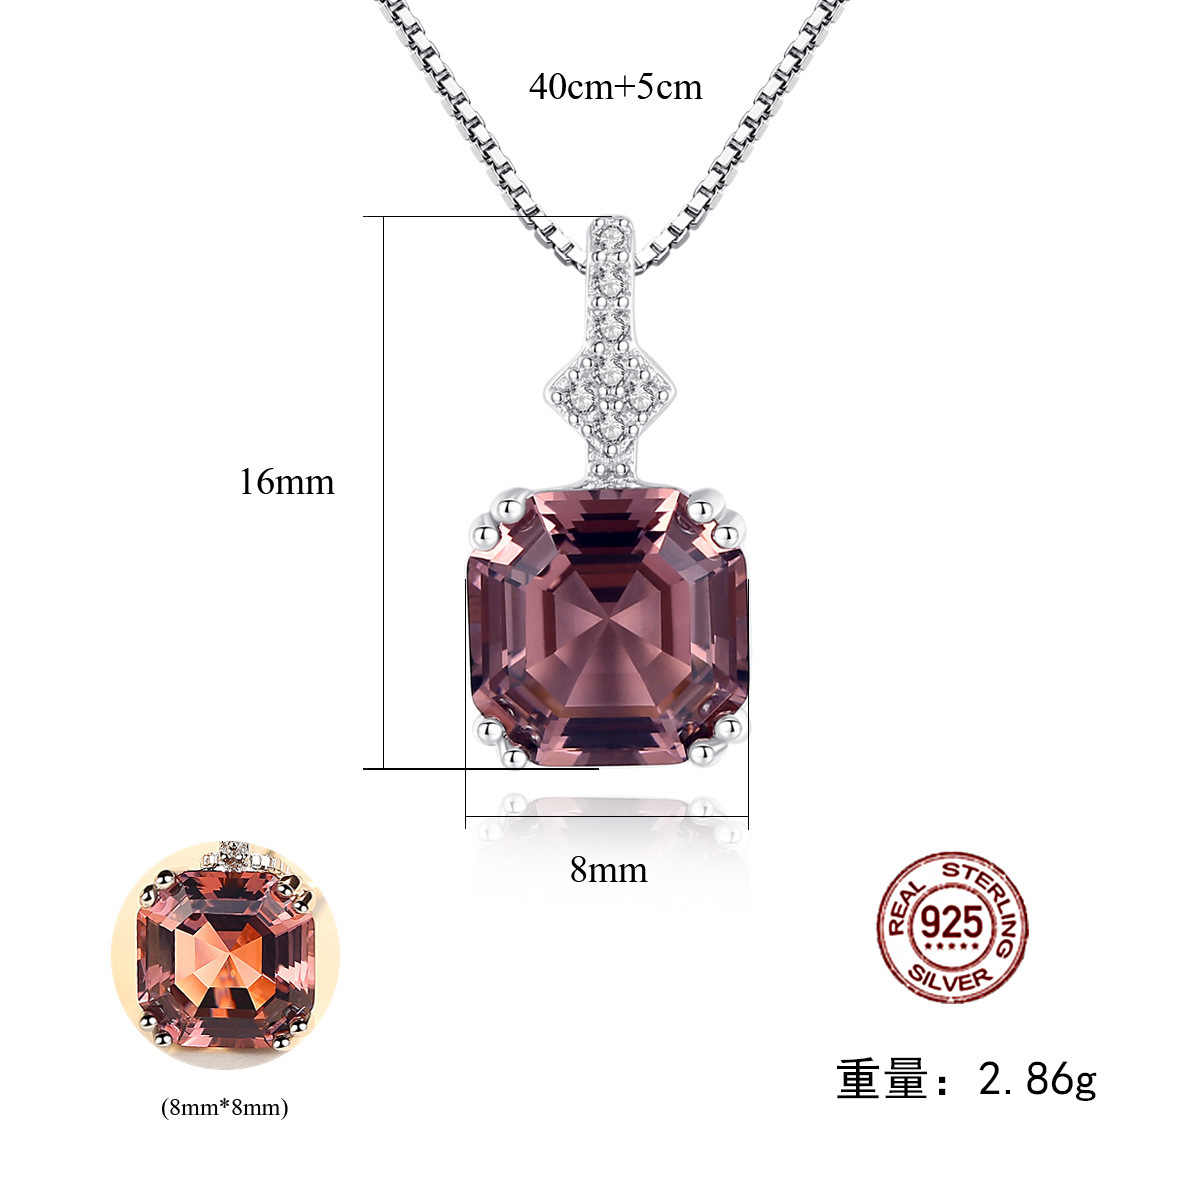 Wong Chuva 100% 925 Prata Esterlina Moissanite Criado Diamantes Pedra Preciosa Morganite Ouro Branco Pingente de Colar de Jóias Por Atacado